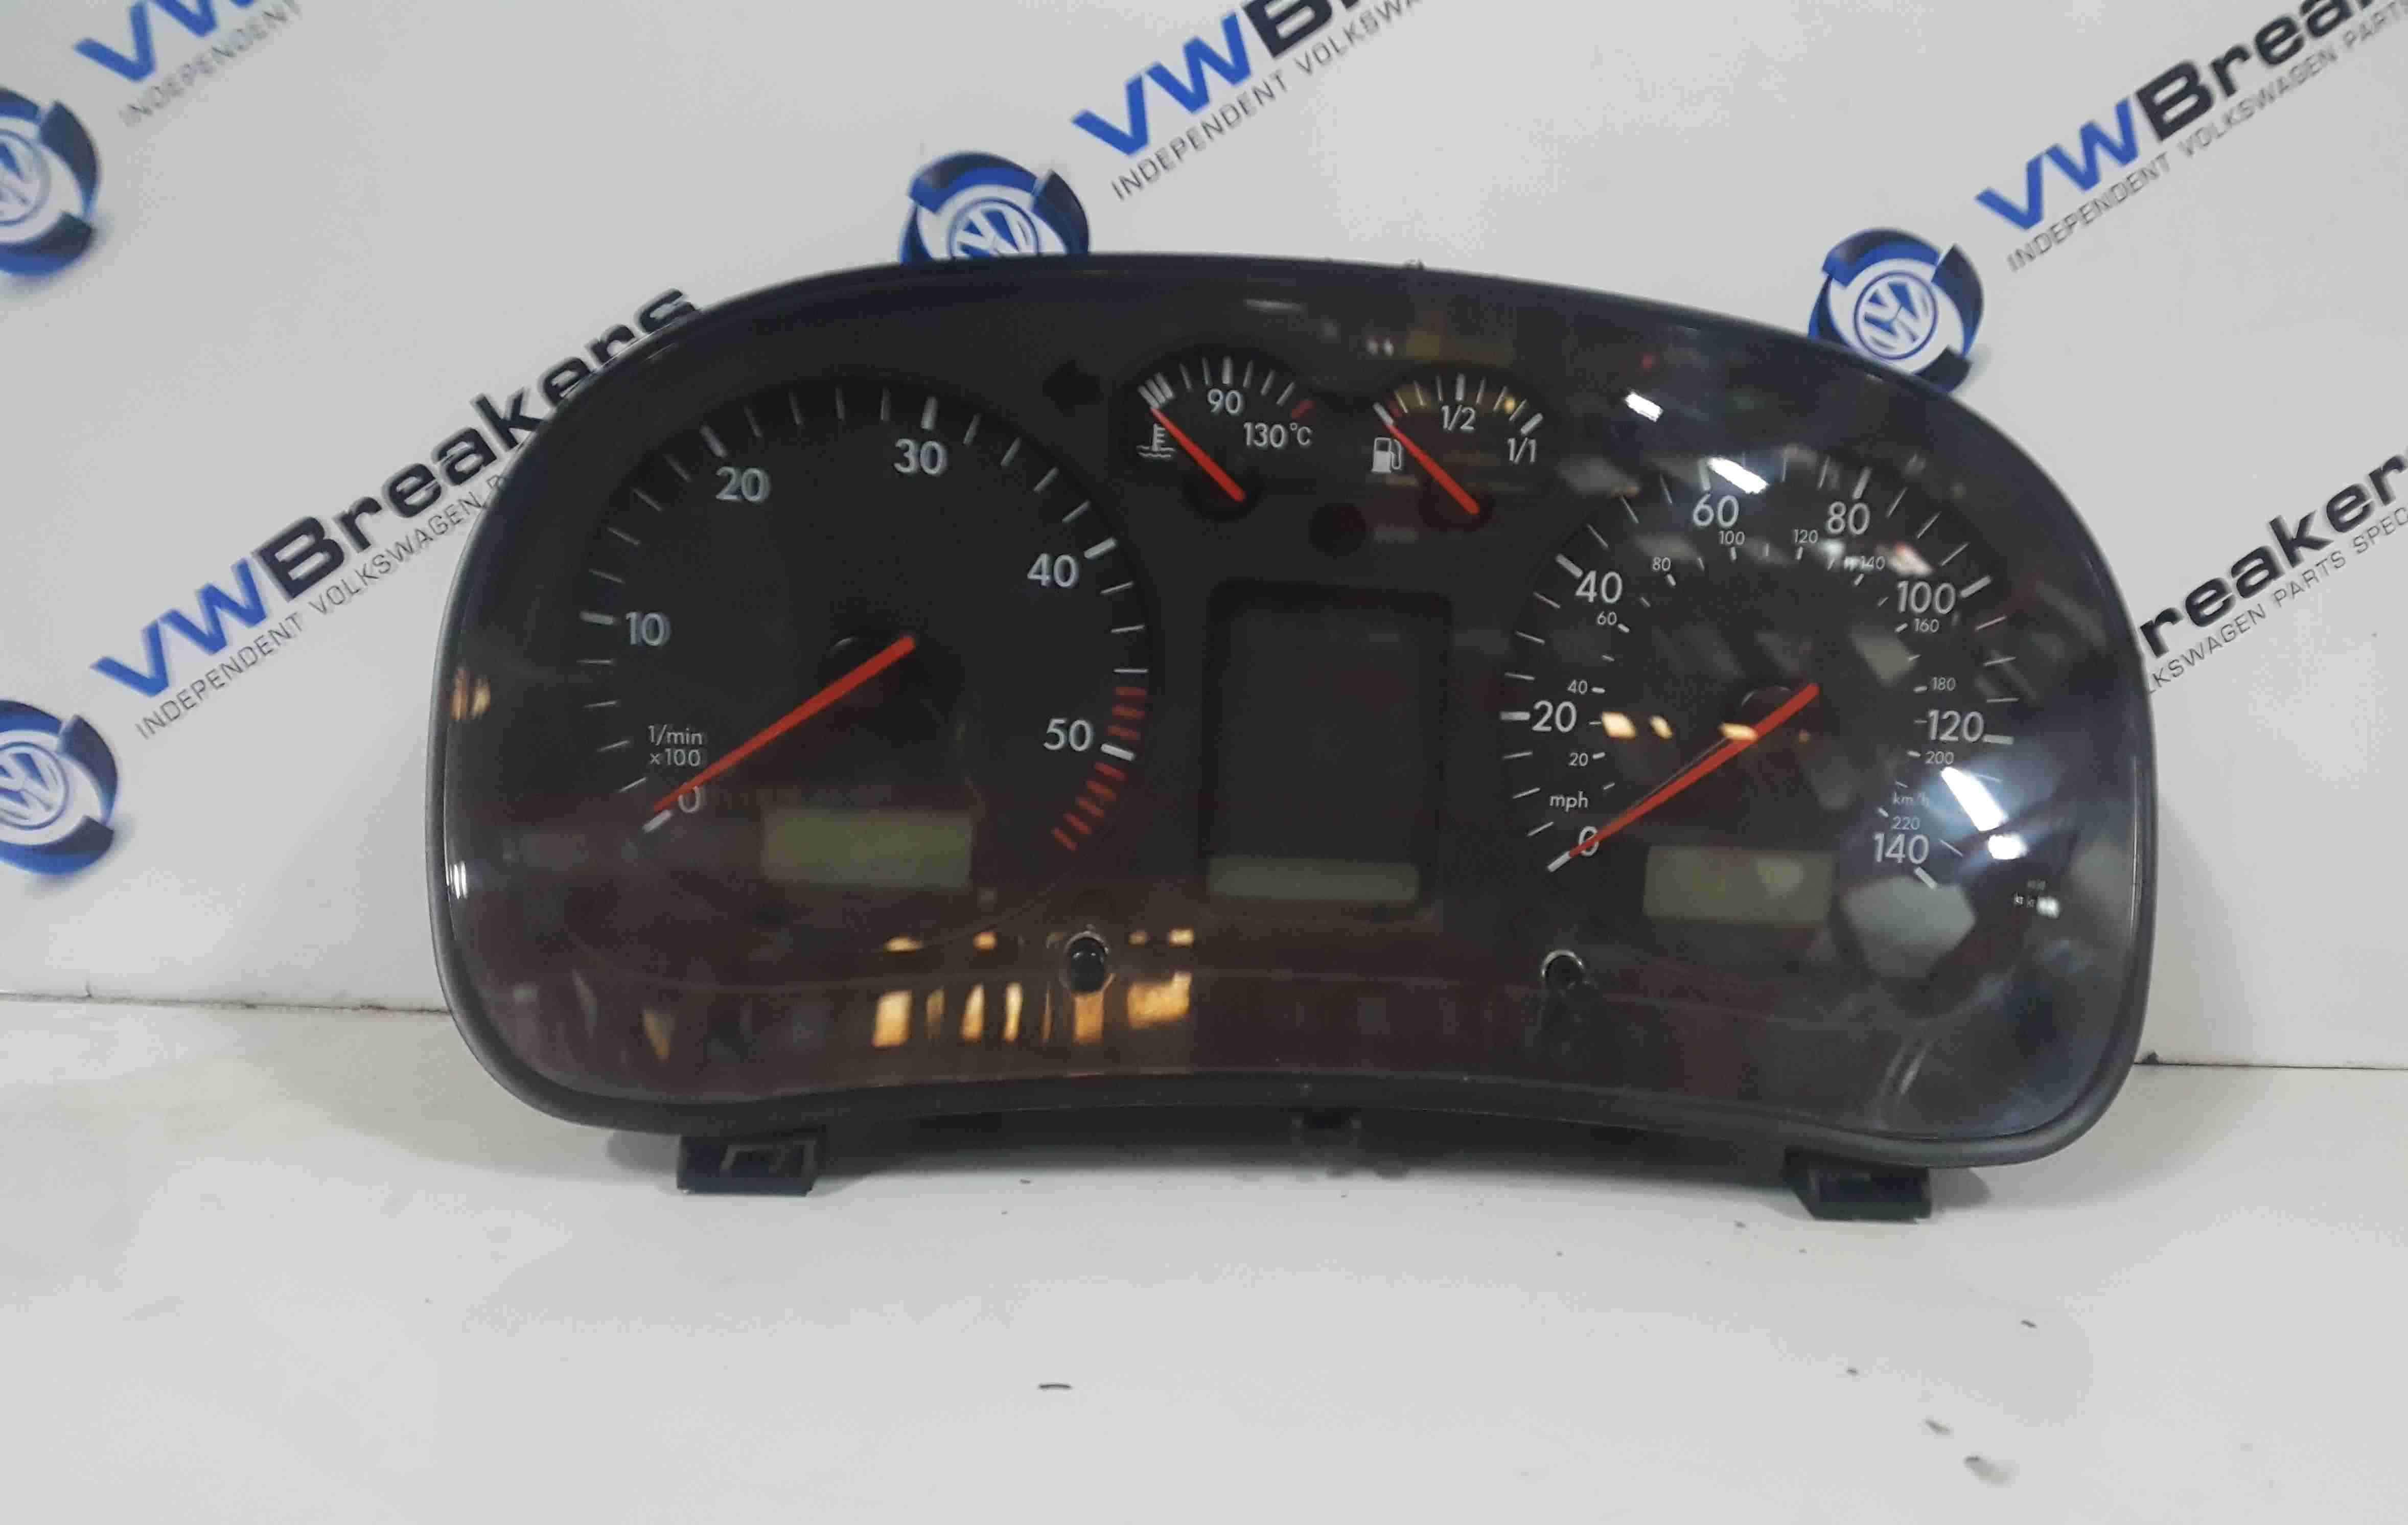 Volkswagen Golf MK4 1997-2004 Instrument Panel Dials Clocks AUTOMATIC 1J0919931E